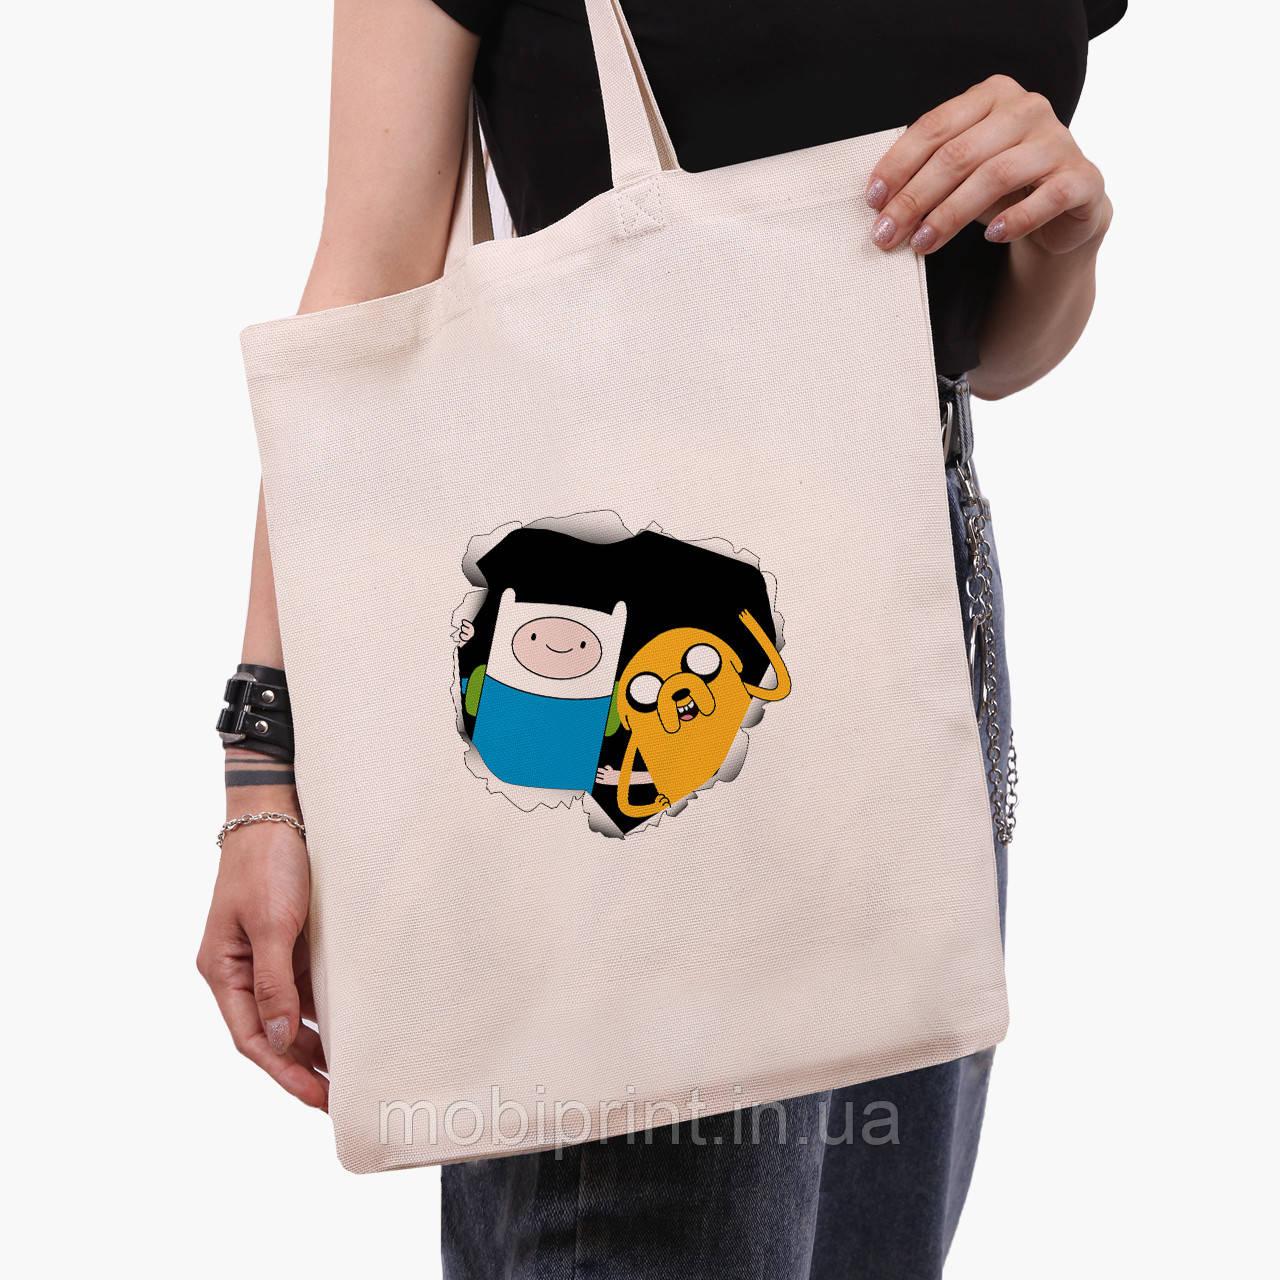 Эко сумка шоппер Финн и Джейк пес (Adventure Time) (9227-1581)  экосумка шопер 41*35 см